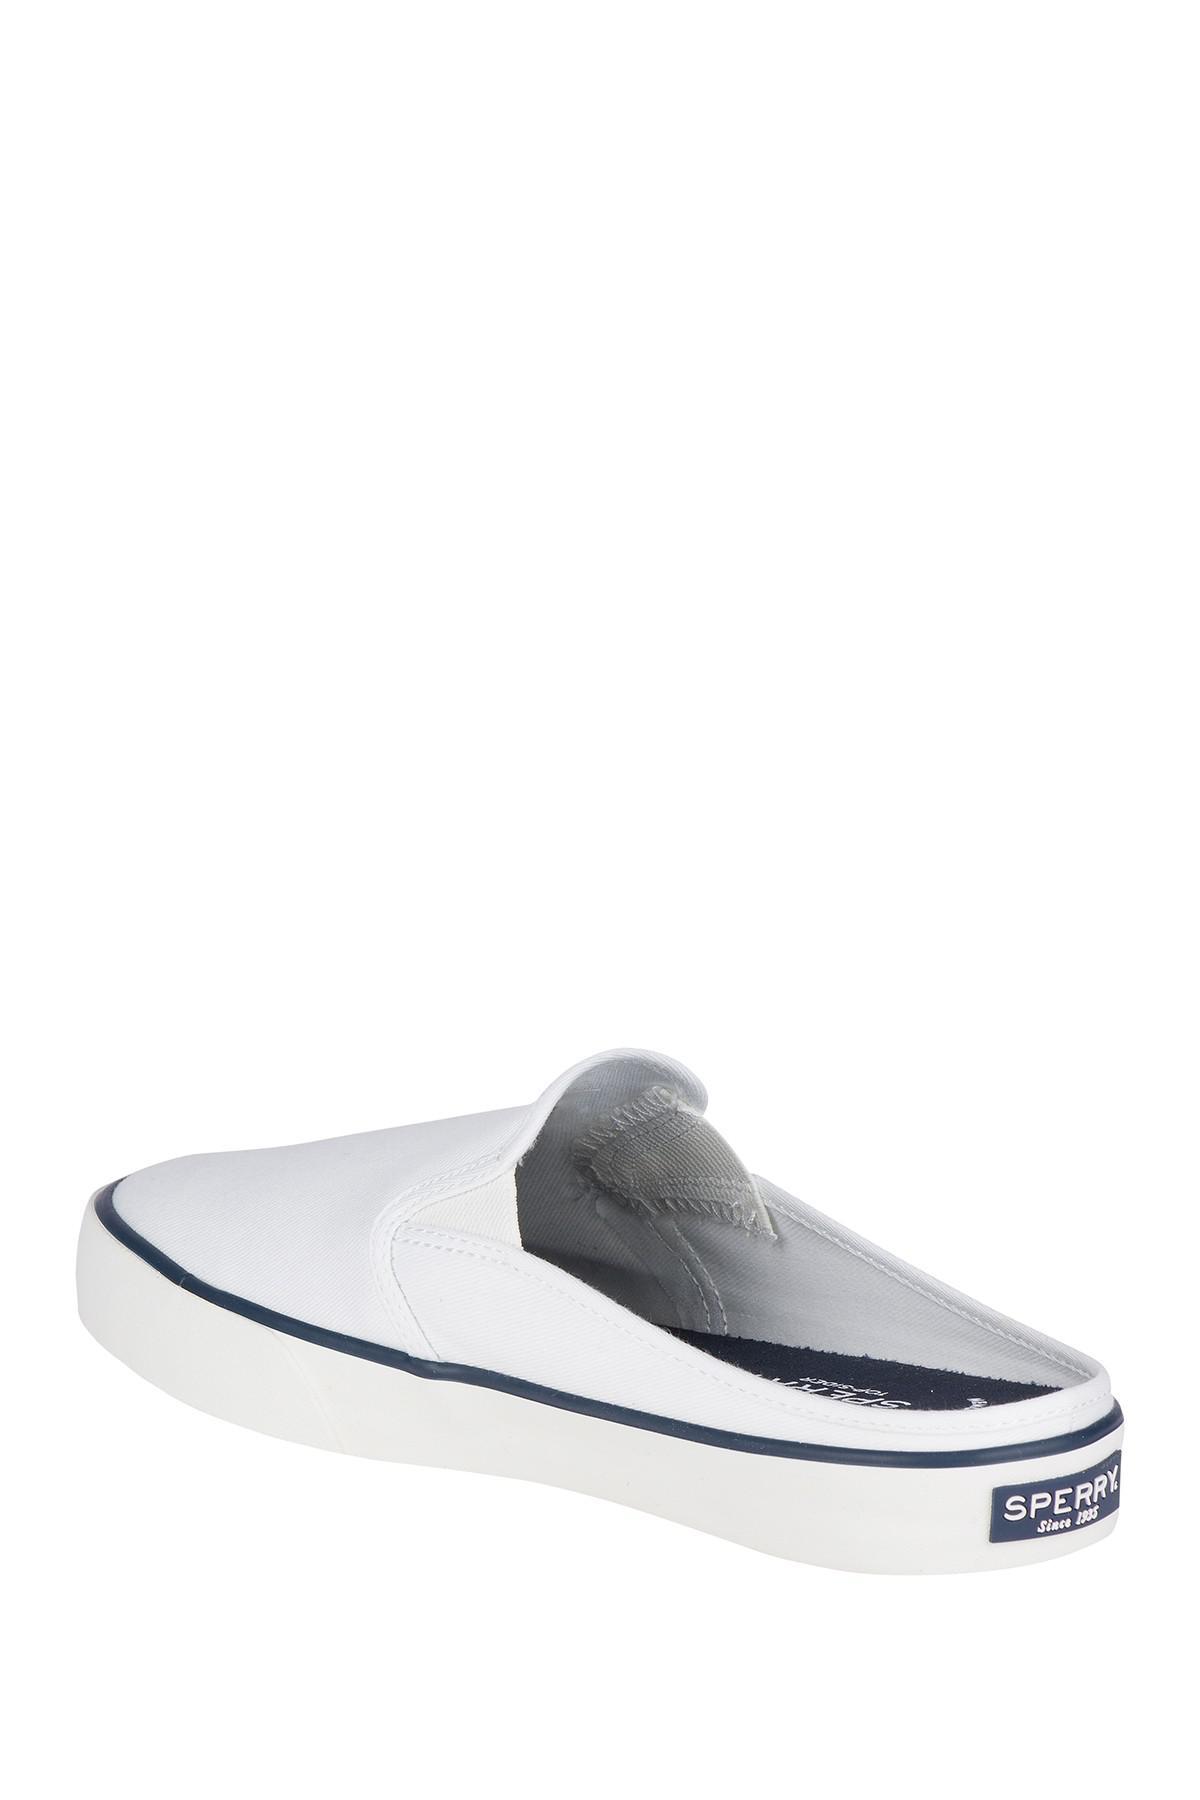 Sperry Pier Randi Slip-On Sneaker RcZQAVlaK